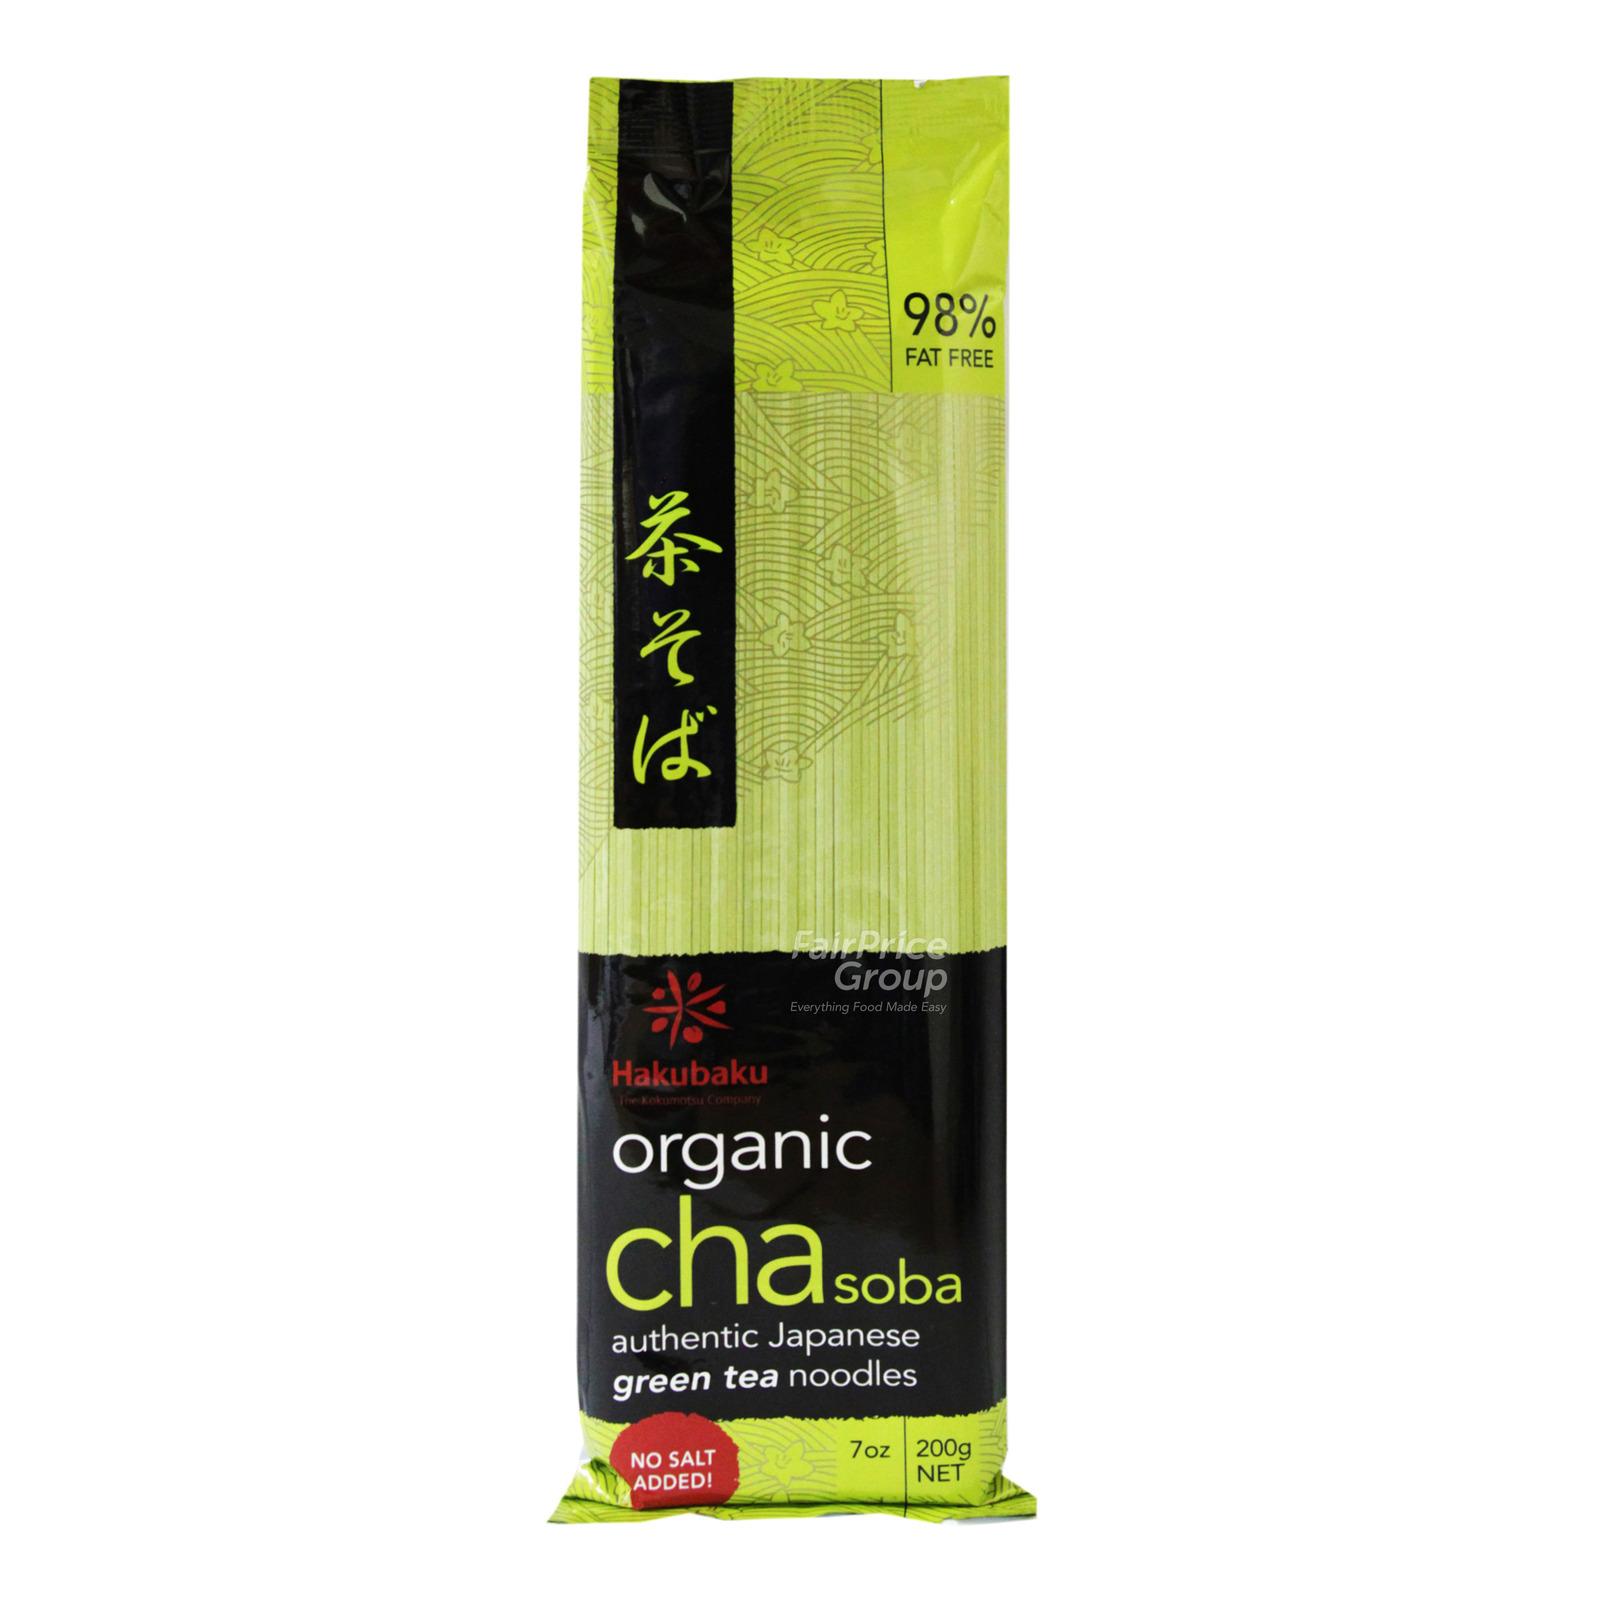 Hakubaku Organic Cha Soba